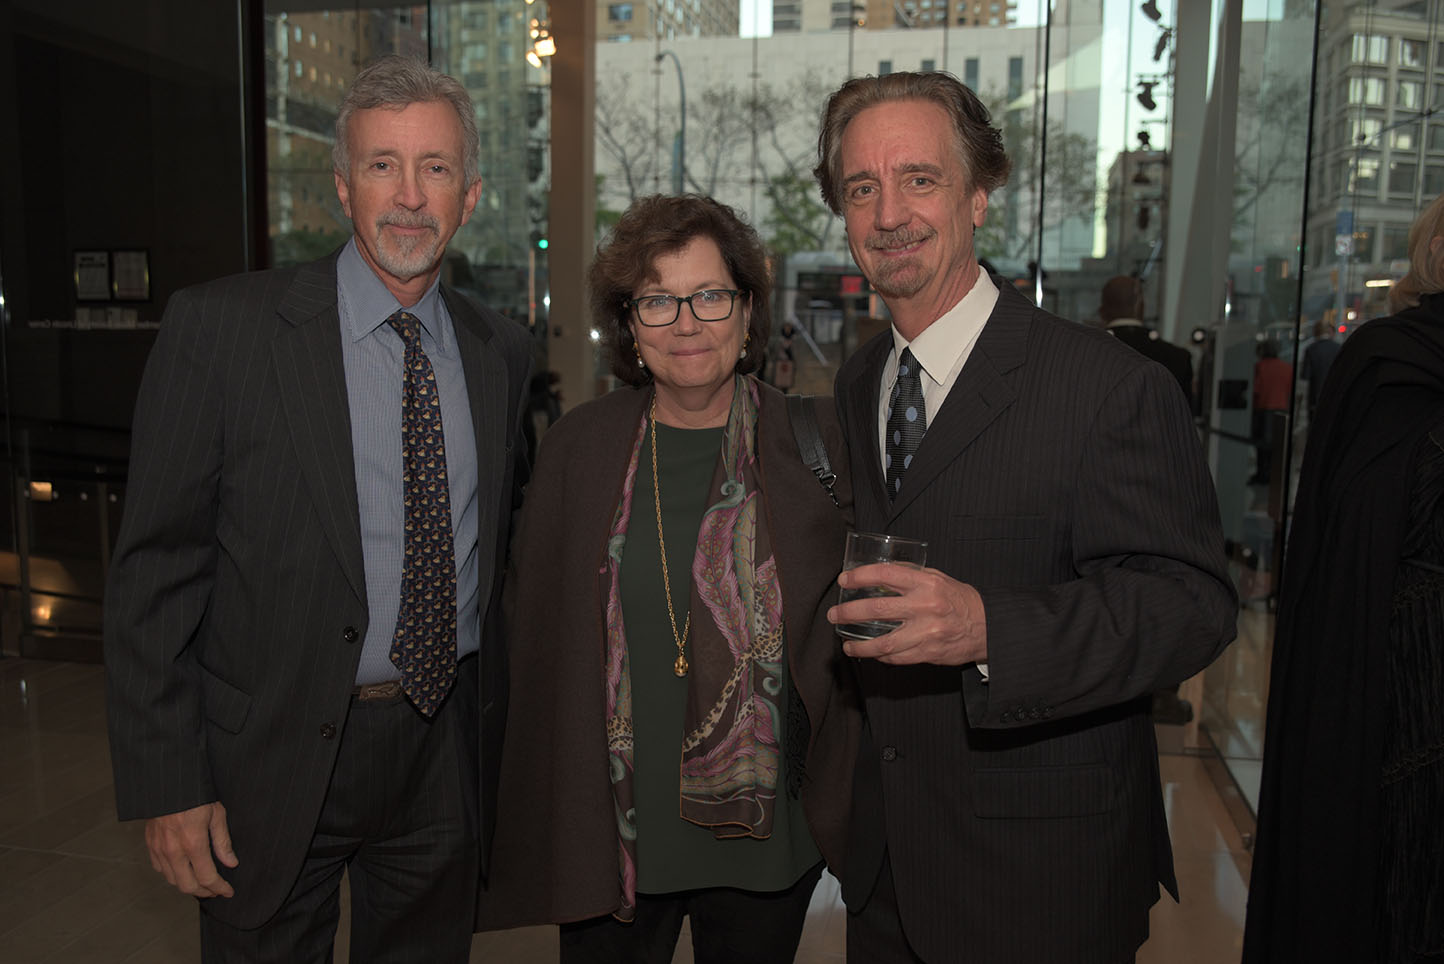 Board member John Lindsey, Julie Lindsey, Artistic Director David Finckel